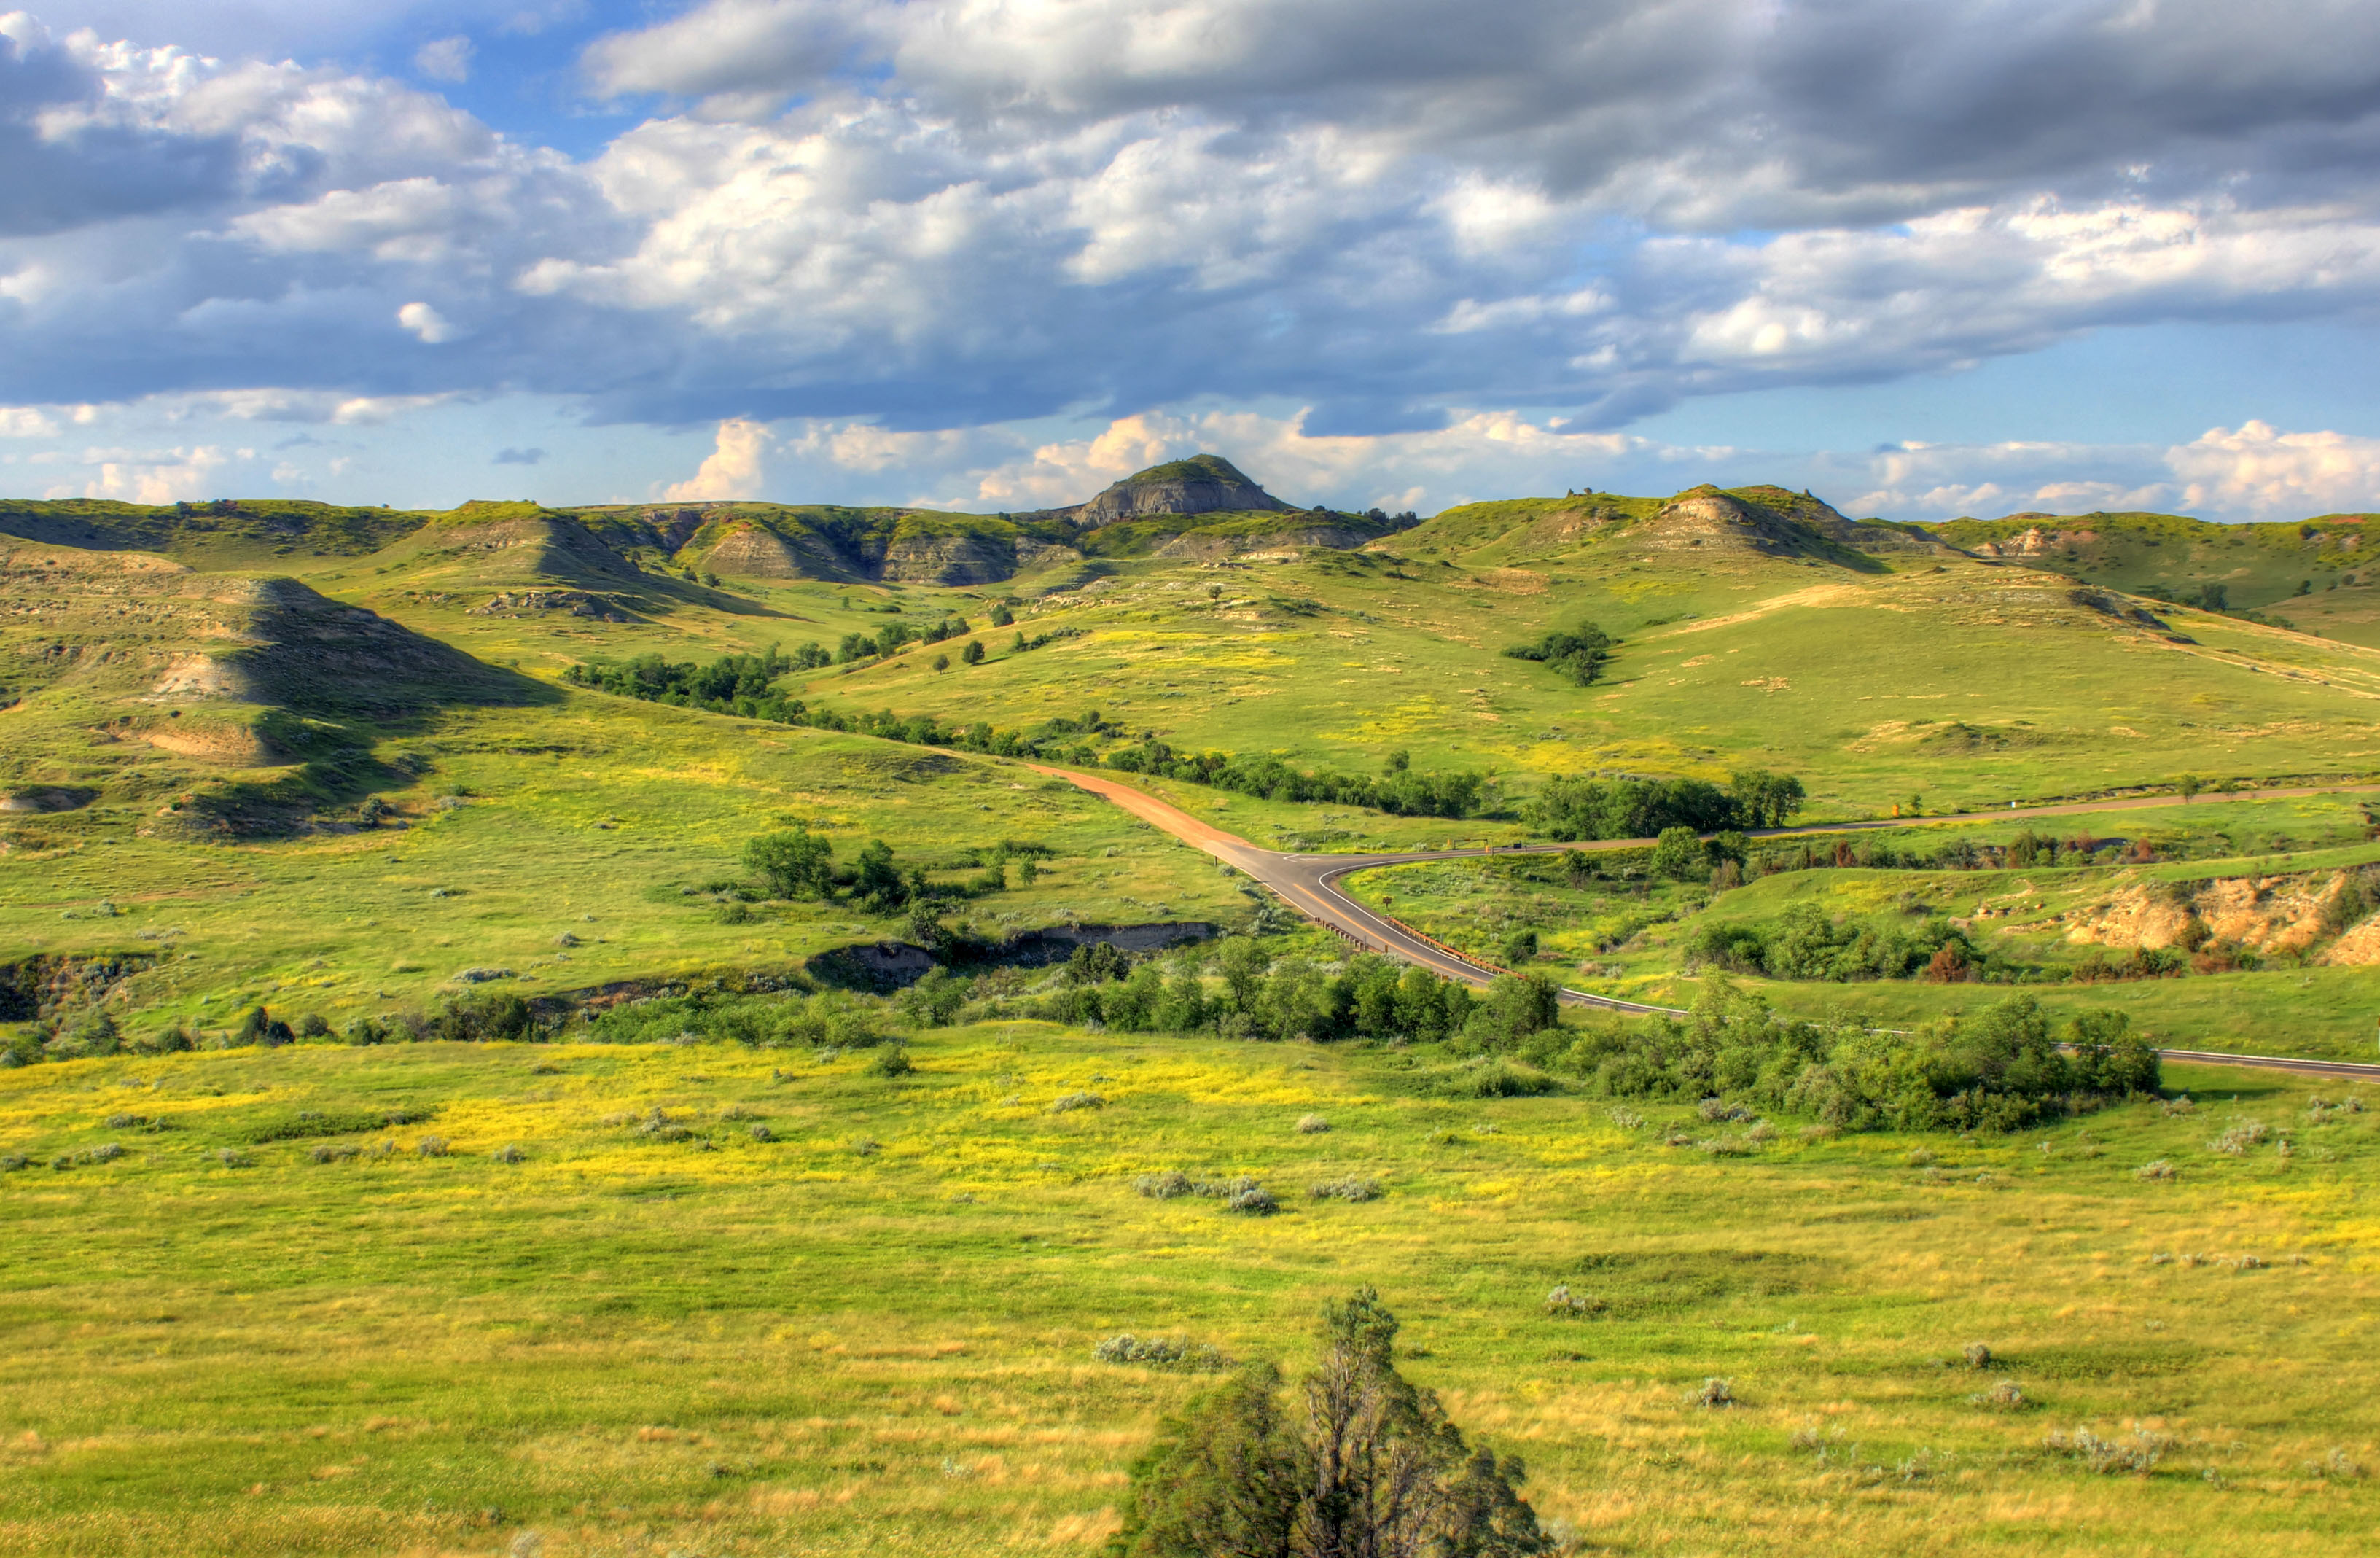 Landscapes of grasslands and hills at Theodore Roosevelt National.